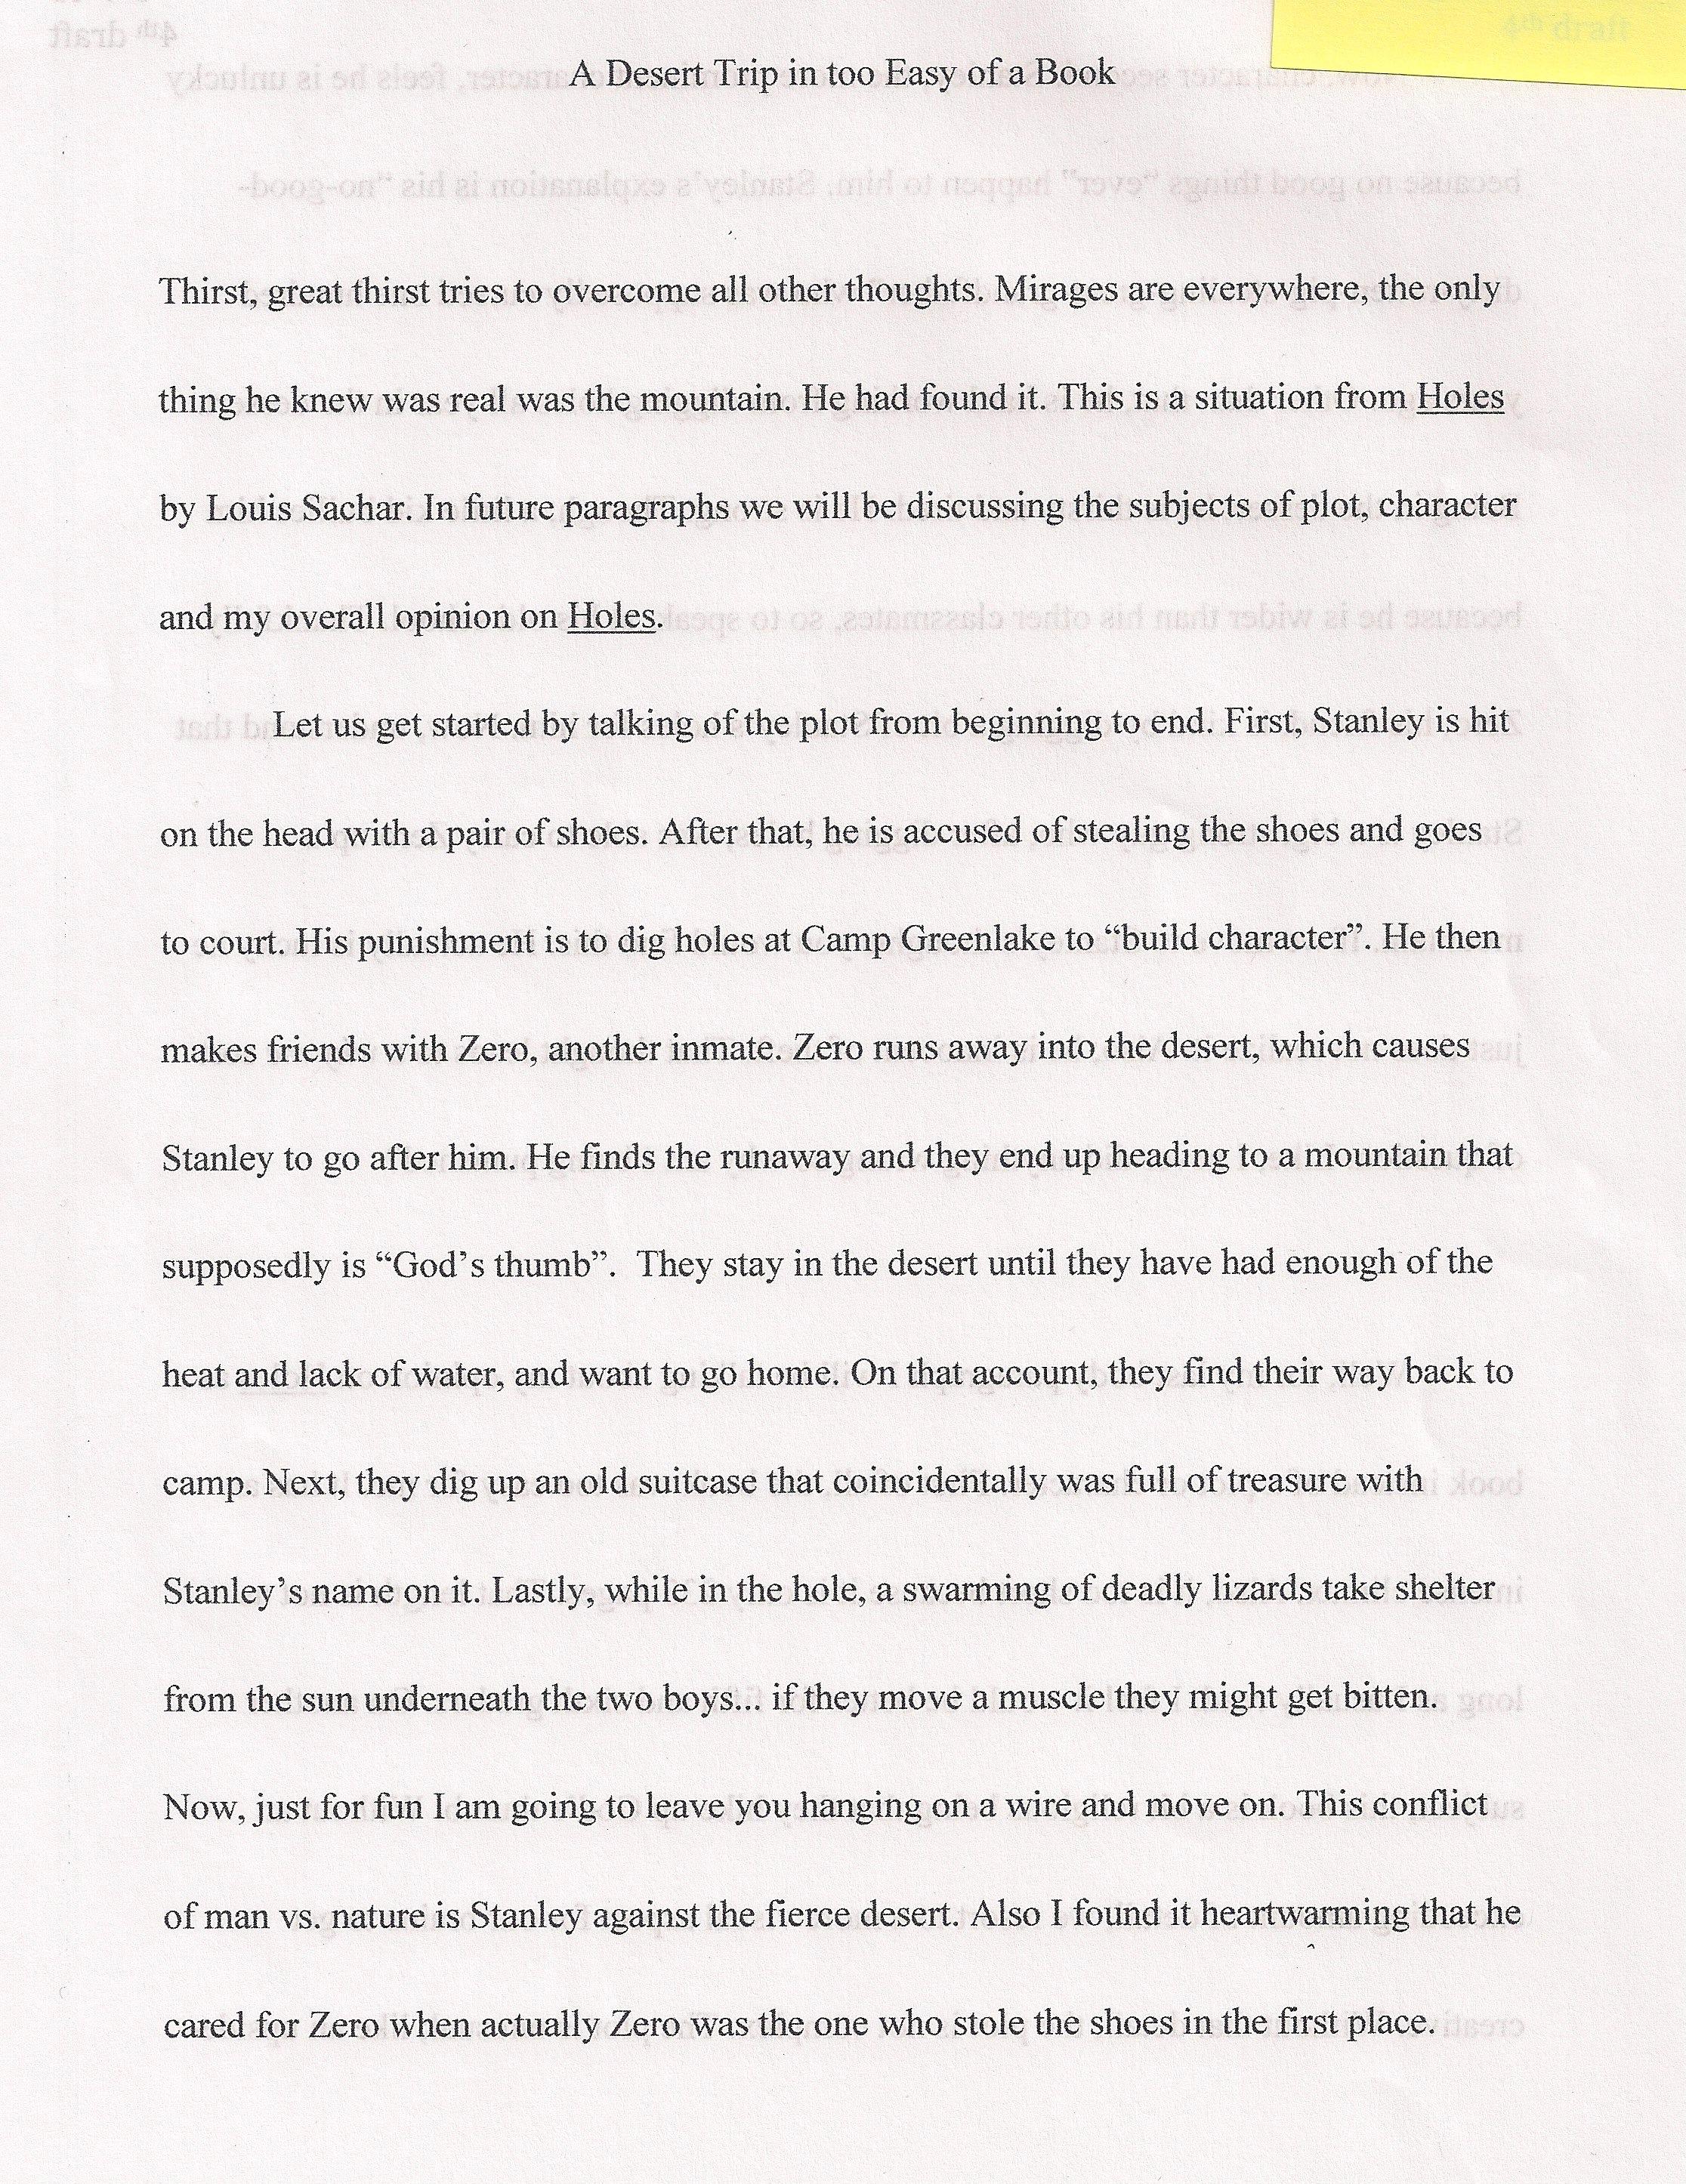 002 6th Grade Essay Topics Example Desert Surprising Reflective Narrative Writing Prompts Science Full